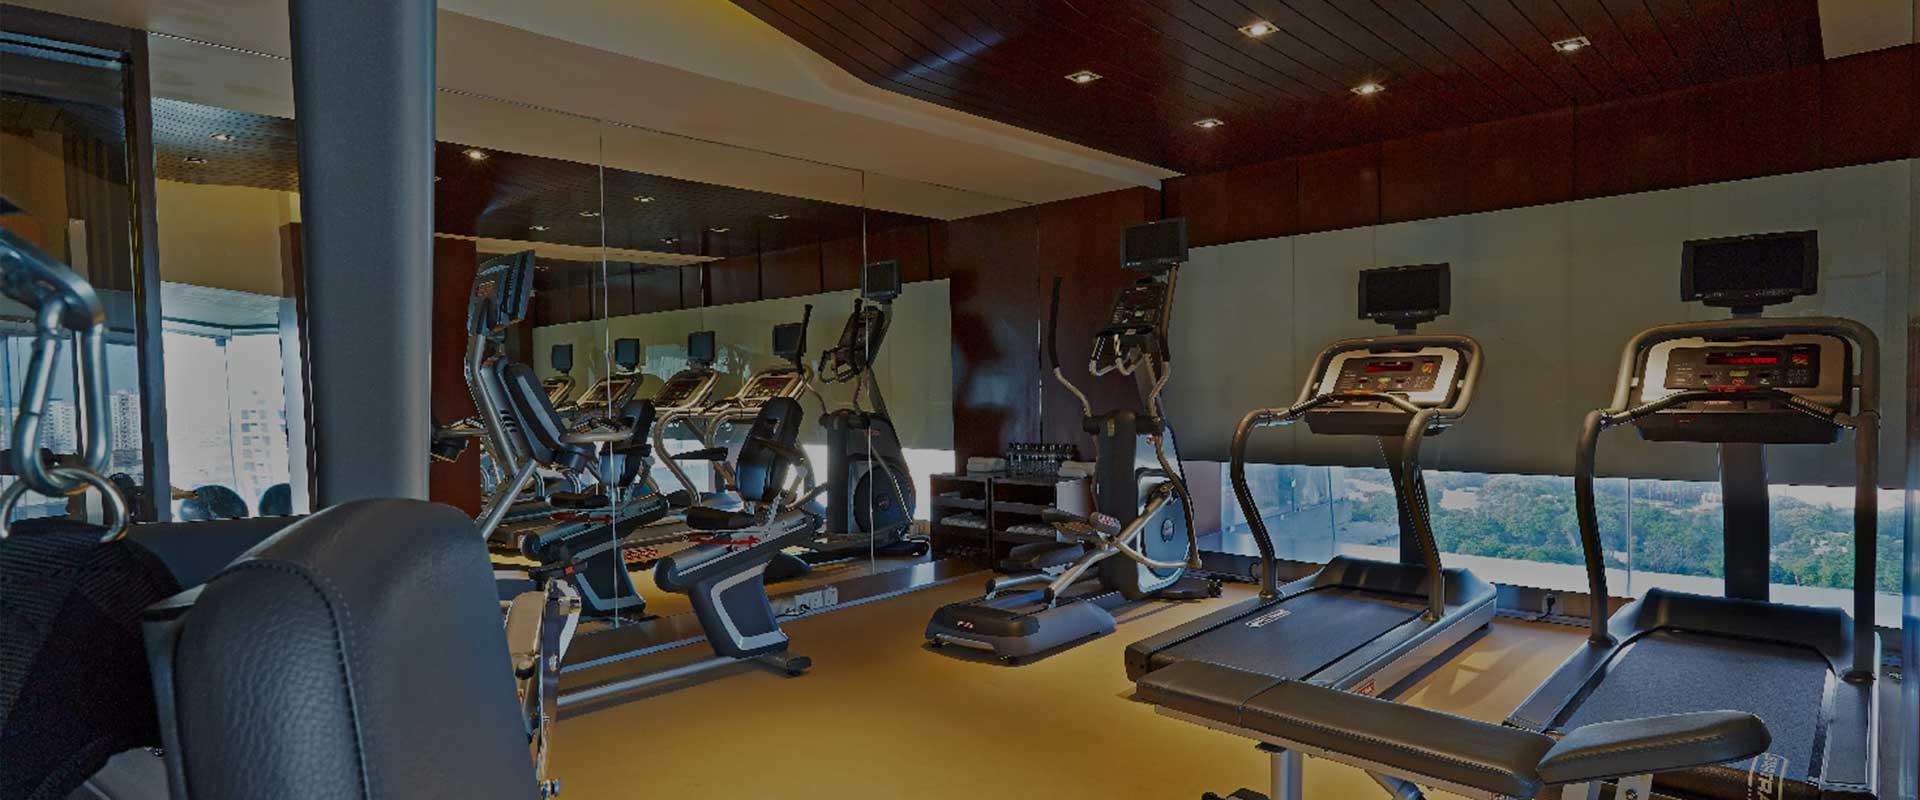 sixseasons-gym